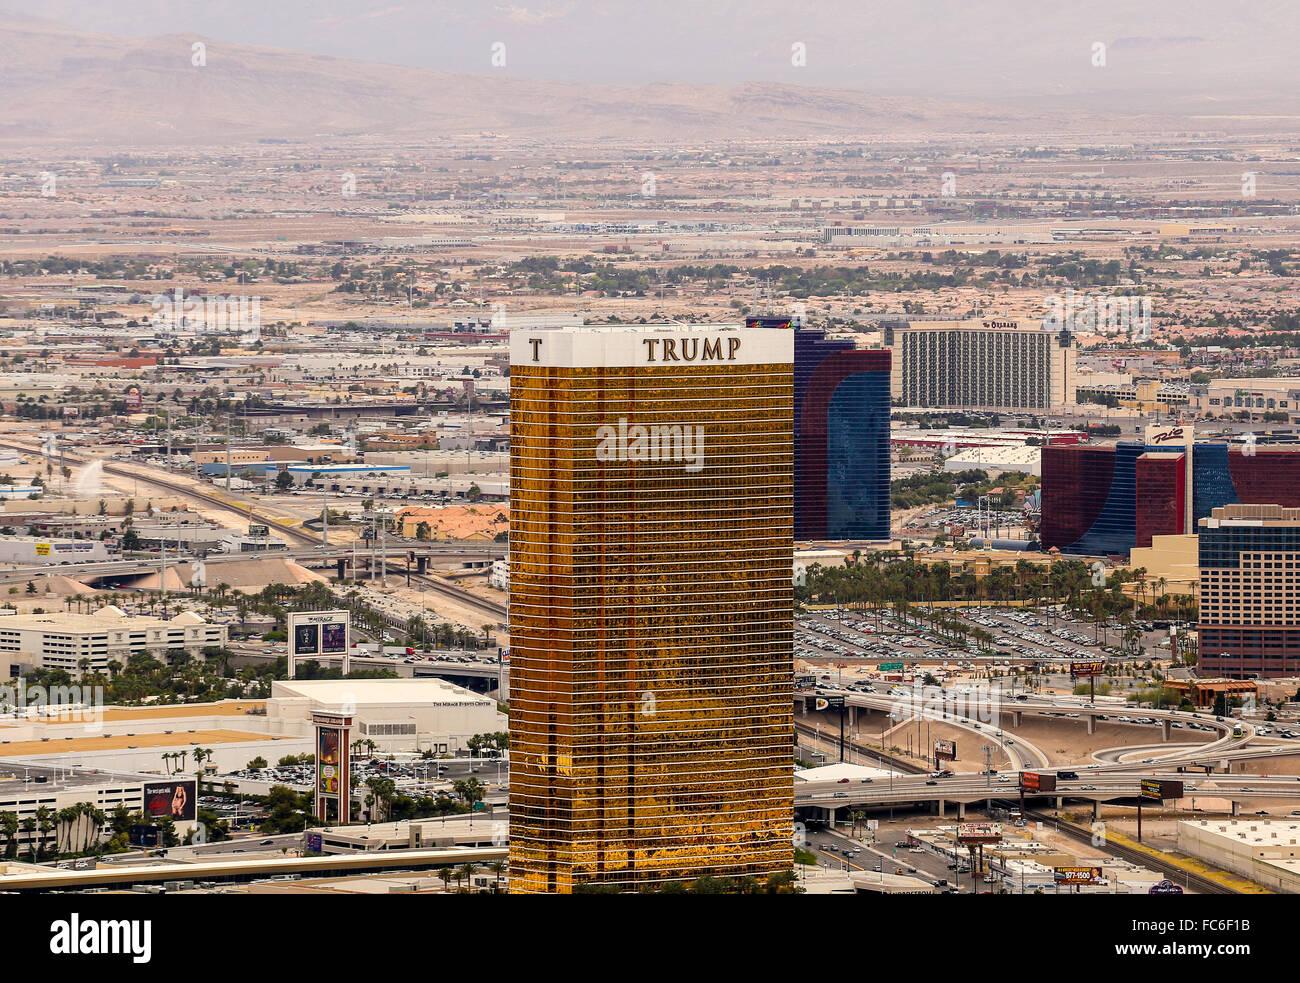 Trump Hotel in Las Vegas Stock Photo